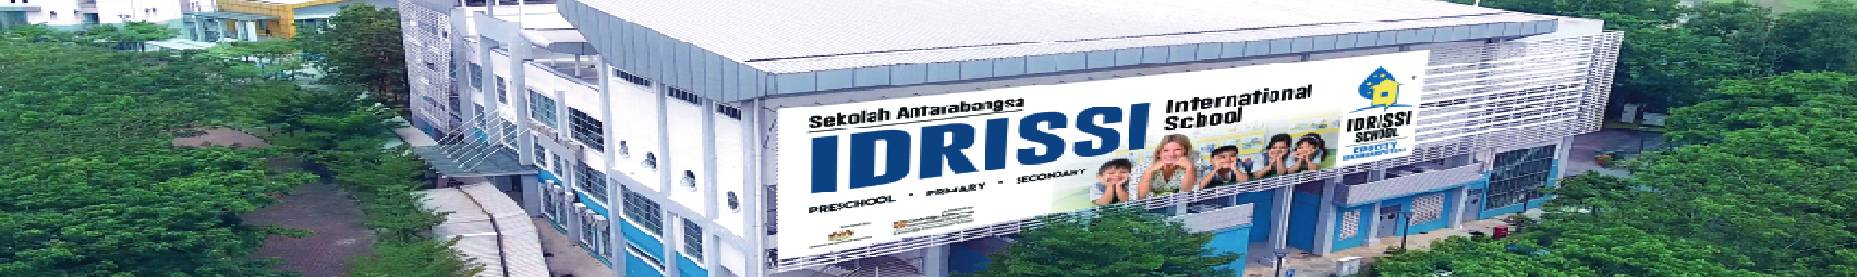 IDRISSI International School, EduCity Iskandar Puteri Banner